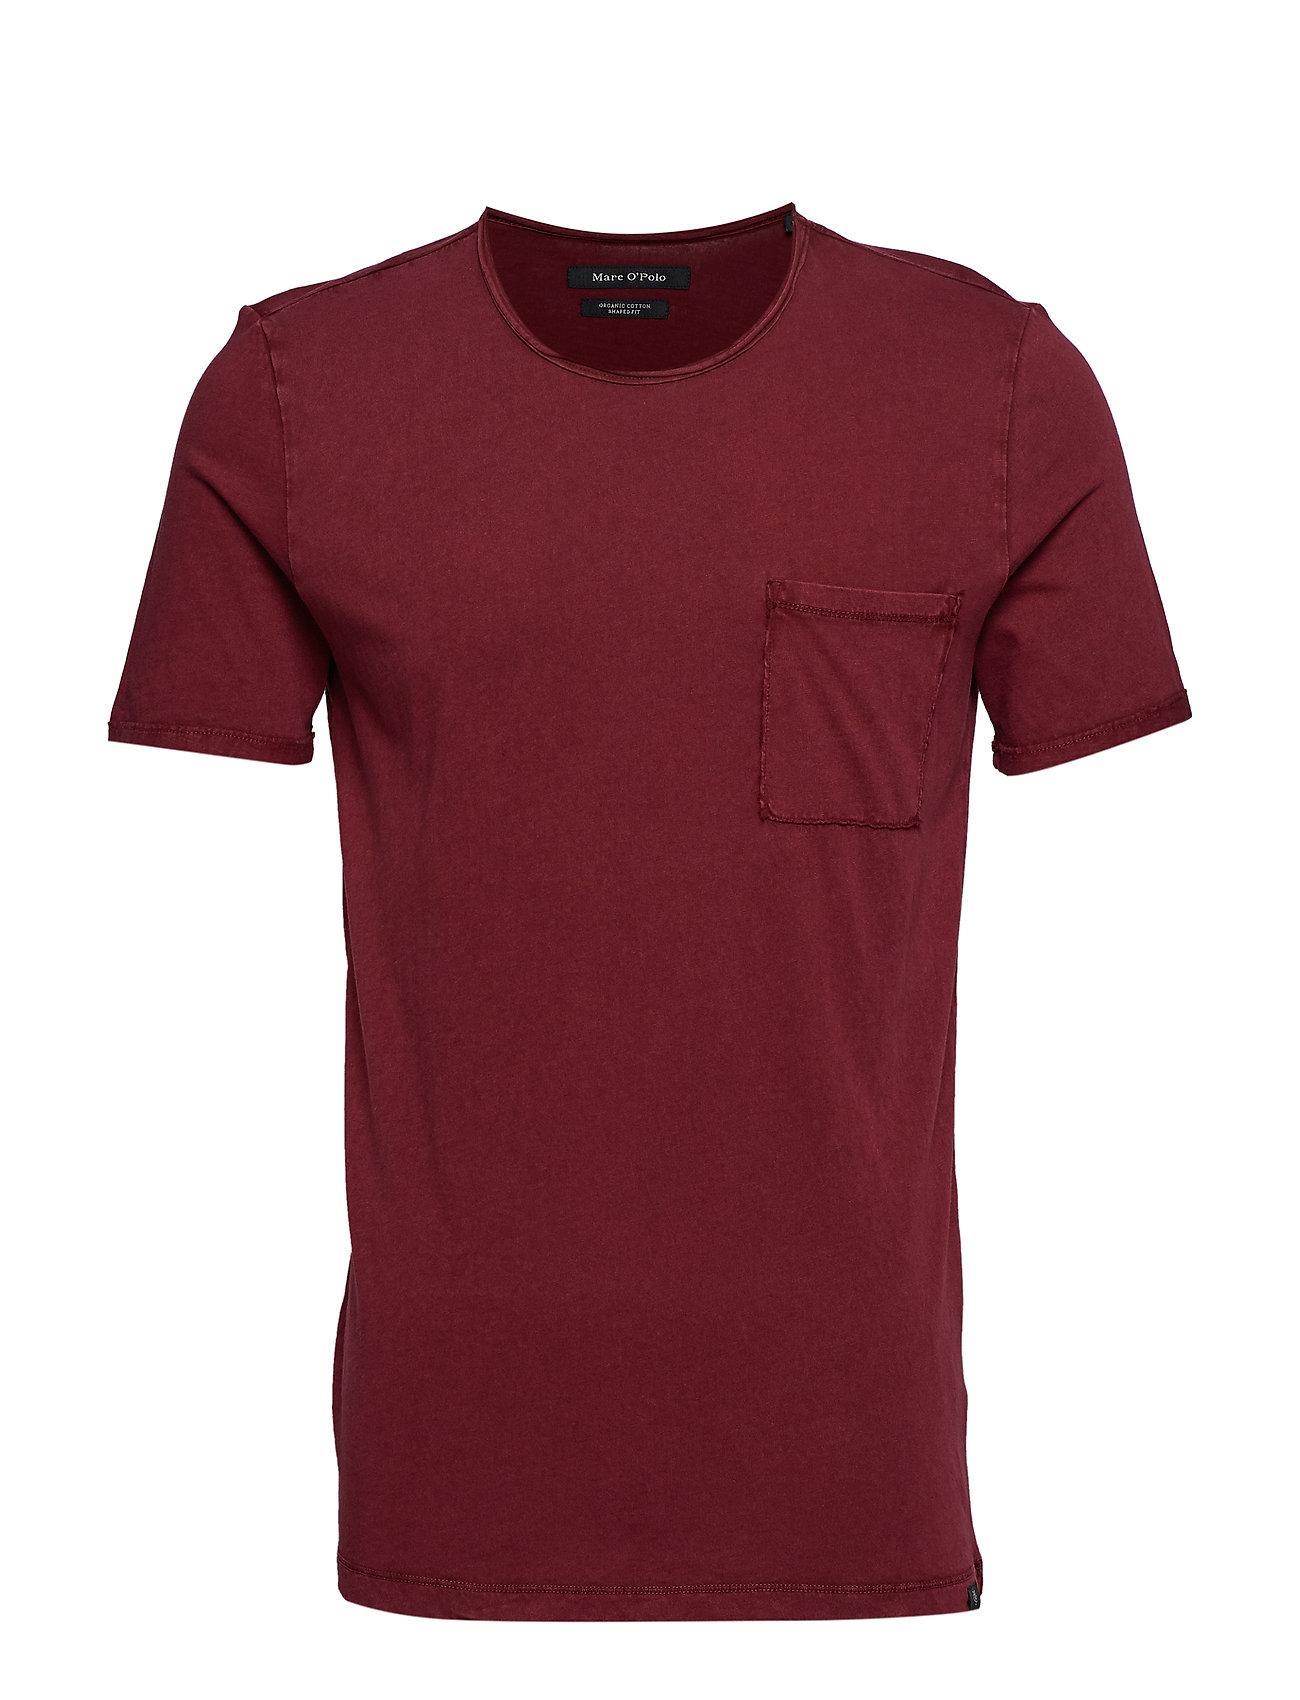 shirt T Sleevetawny PortMarc Short O'polo jL4Rq35A